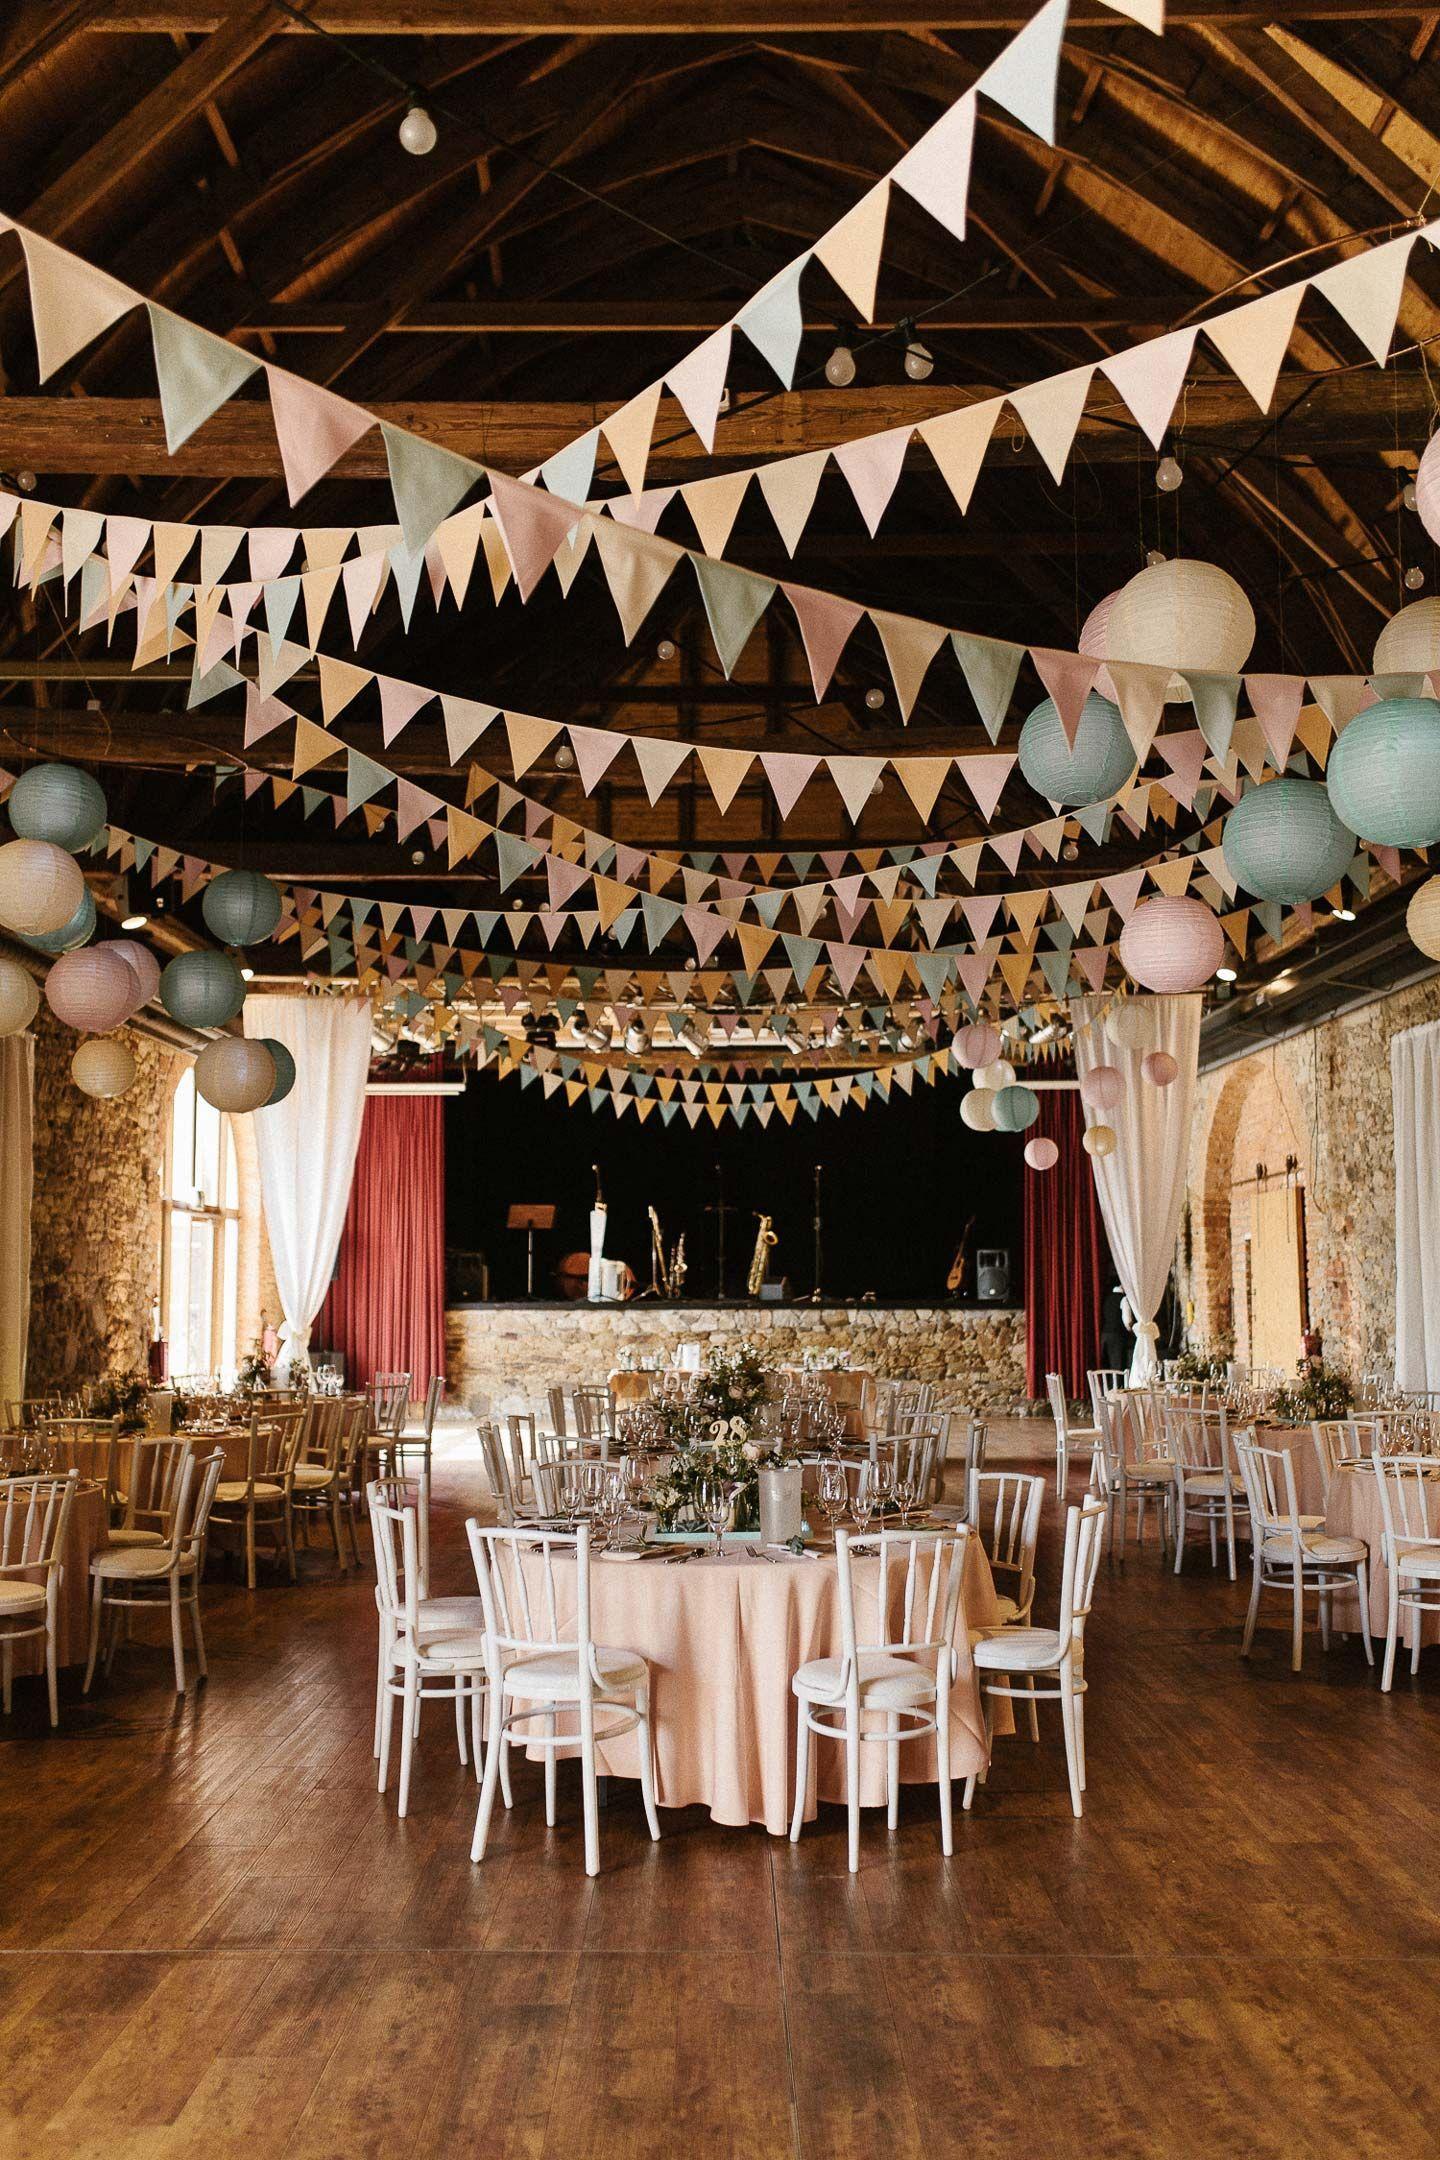 Natalie Julian Romantic Vintage Wedding In Pastel Wedding Delusion Be Inspired Vintage Weddin In 2020 Pastell Hochzeit Vintage Hochzeit Vintage Hochzeit Deko